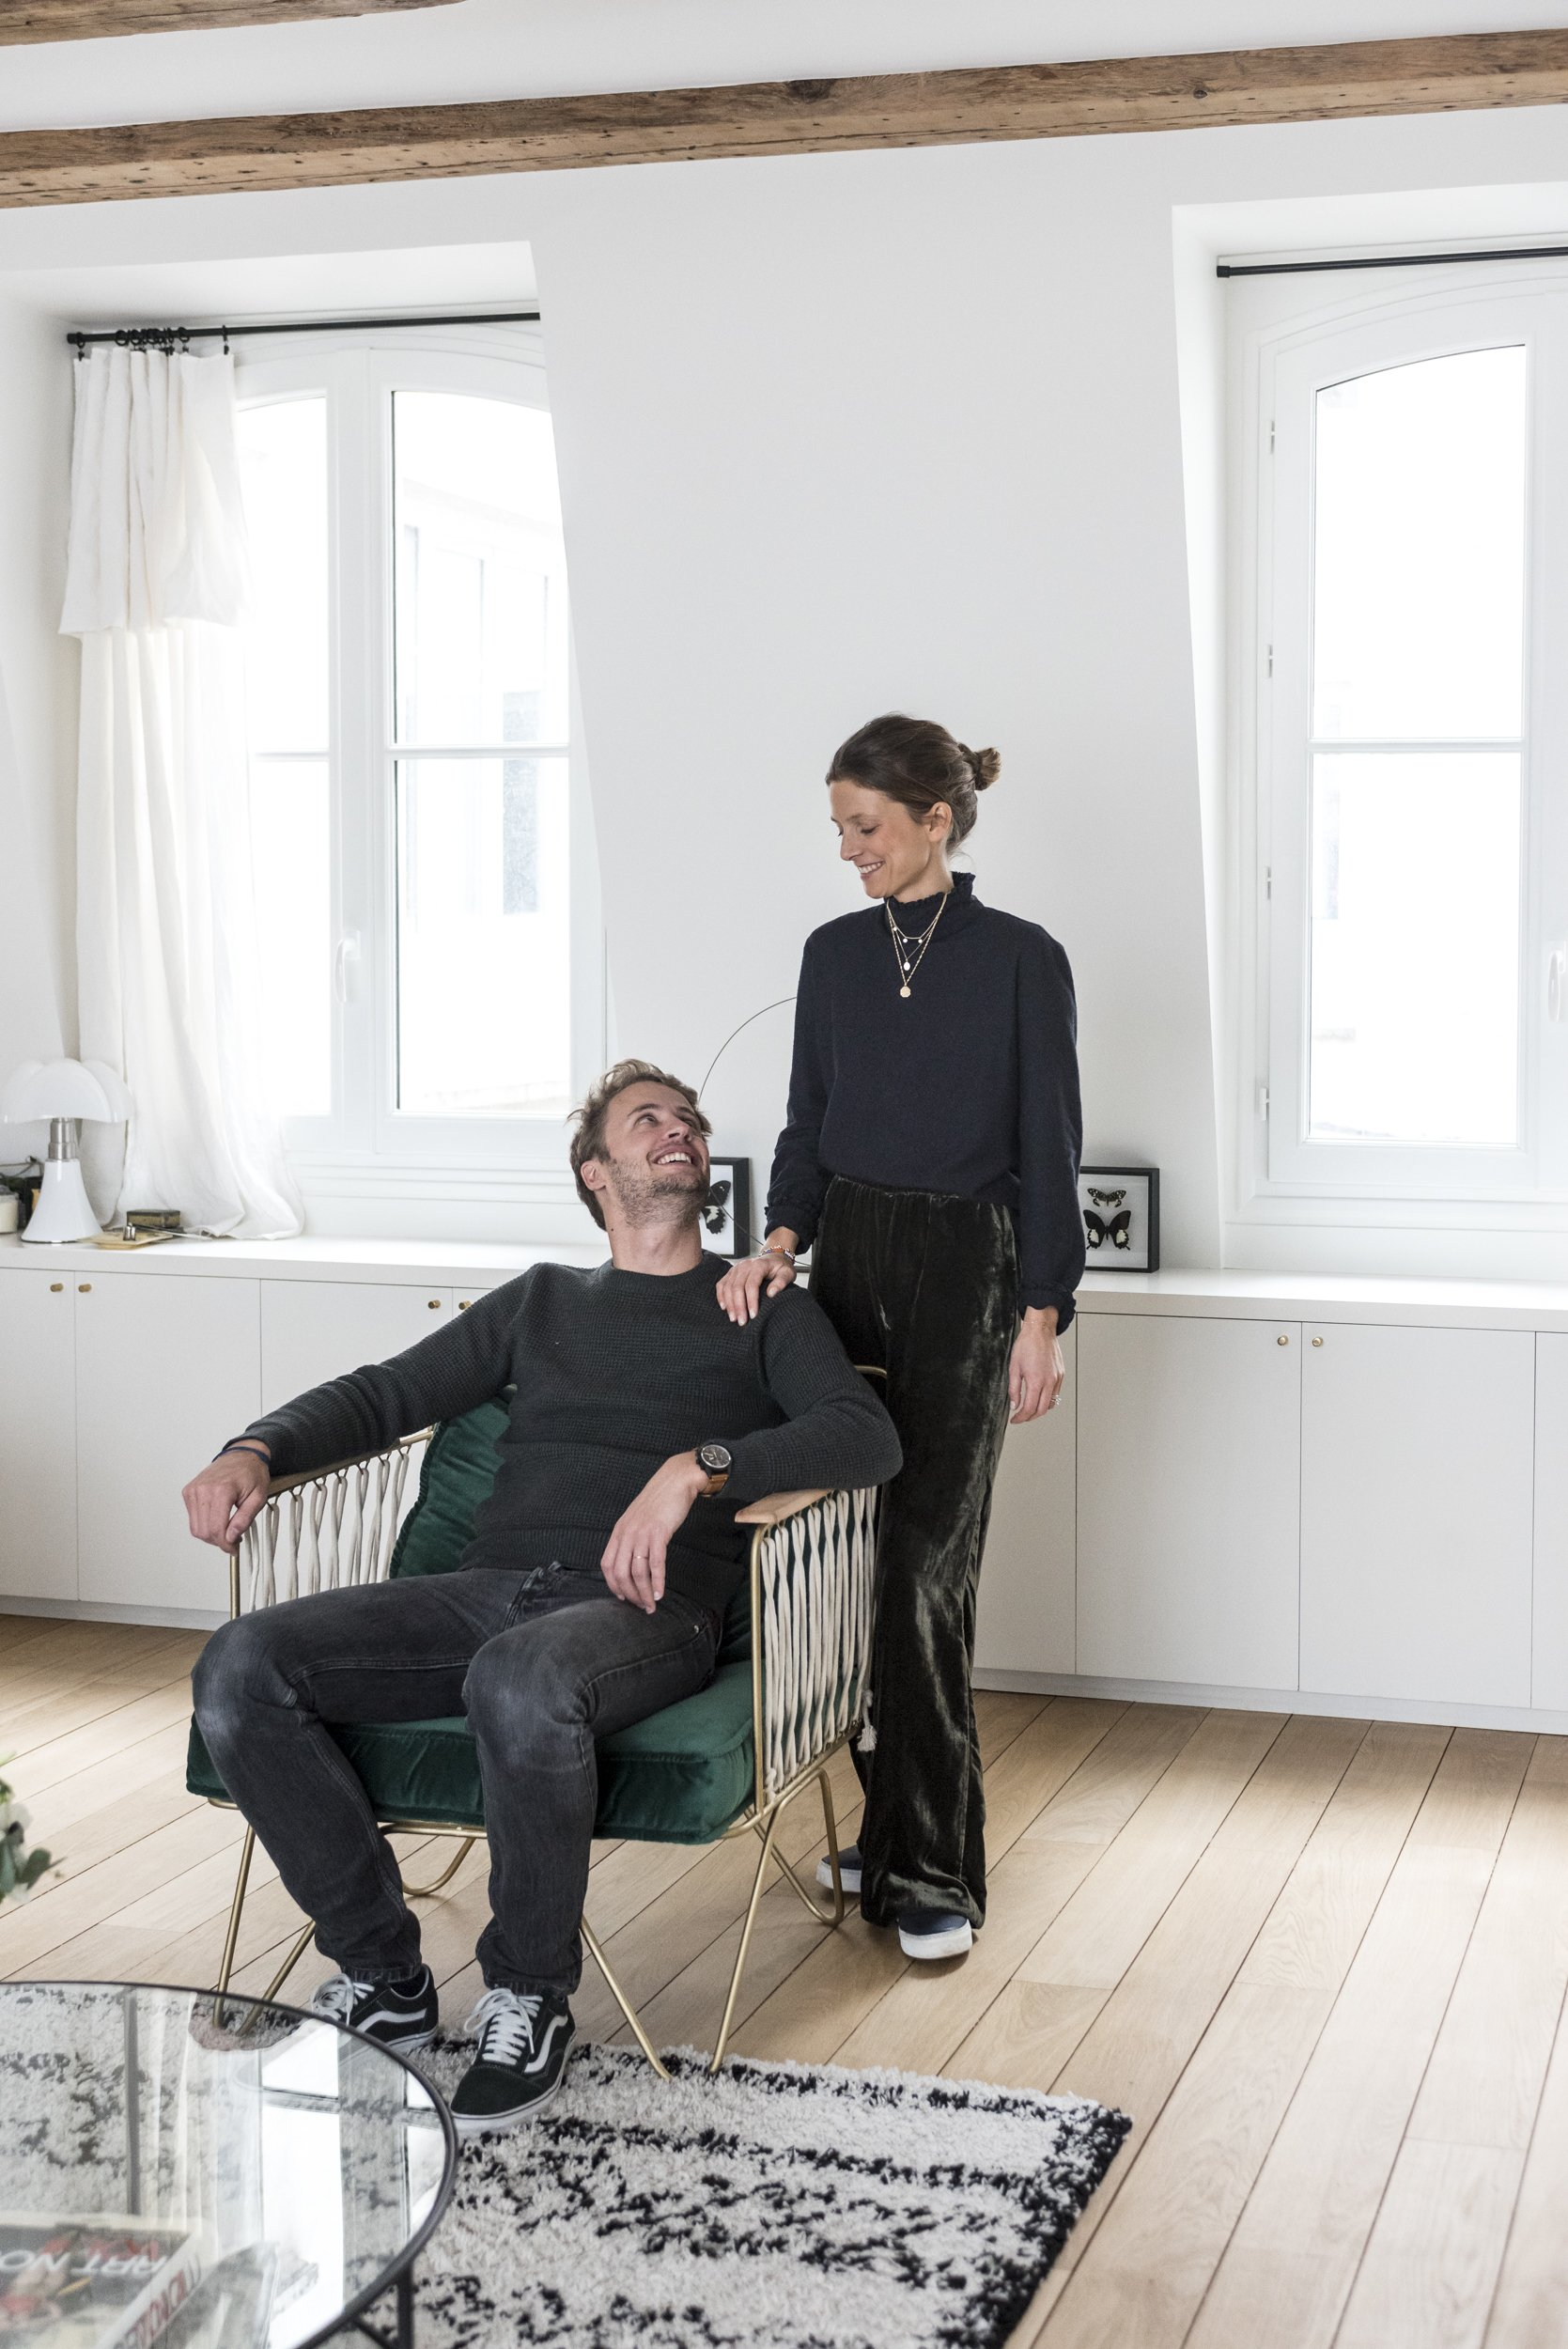 Jessica and Hugo Mulliez